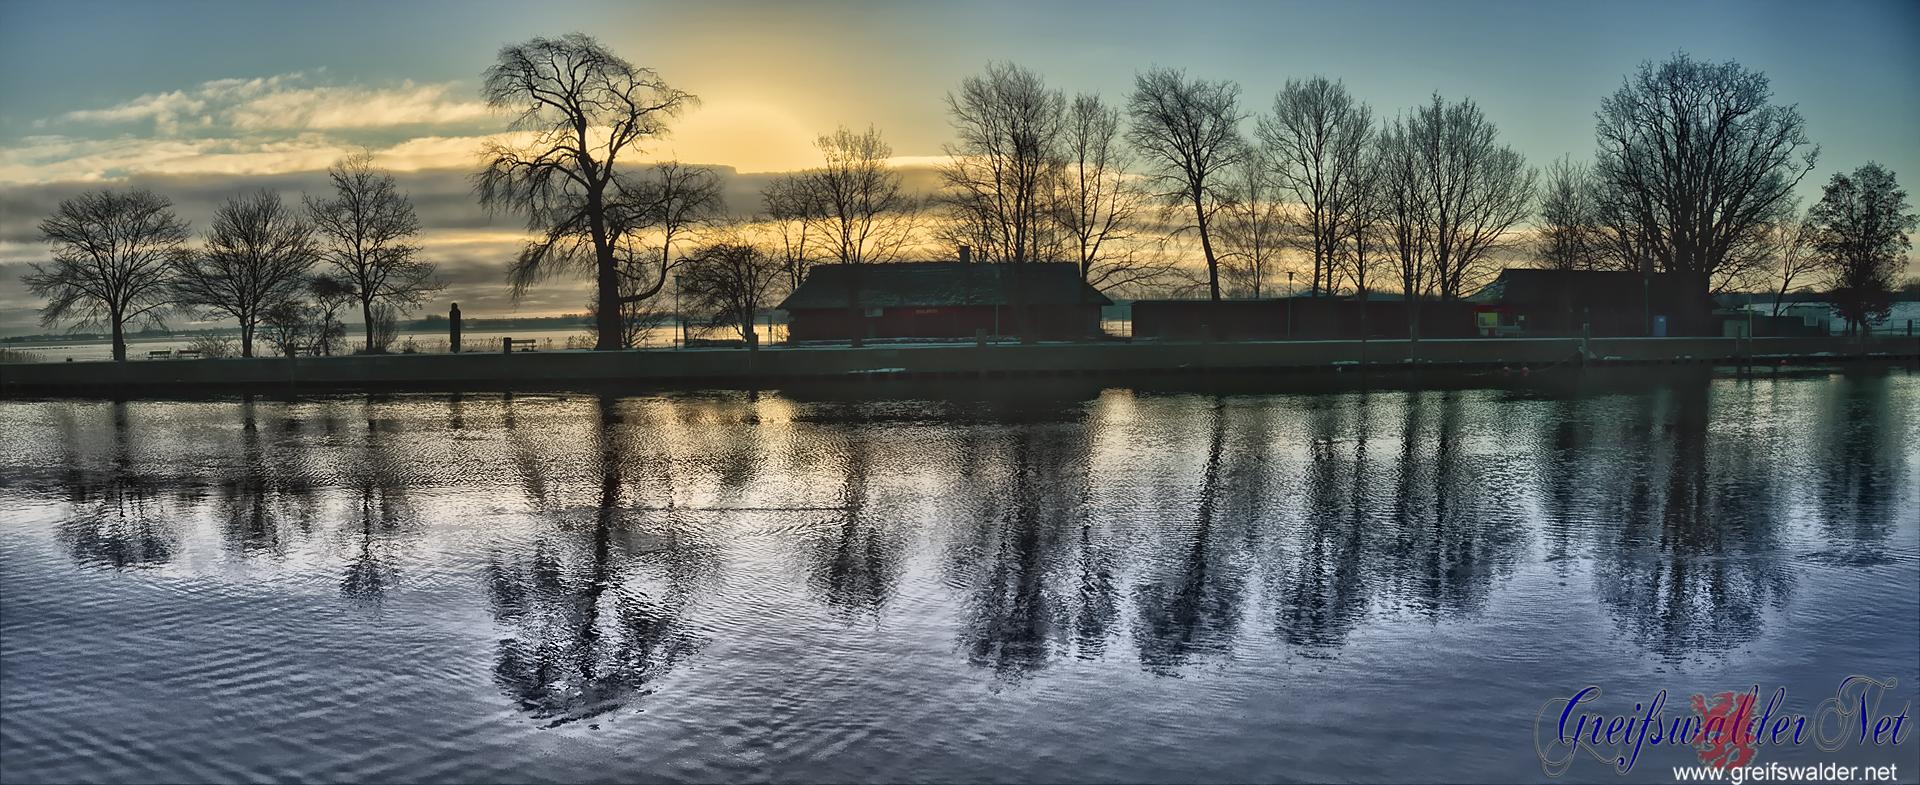 Ryck in Greifswald-Wieck